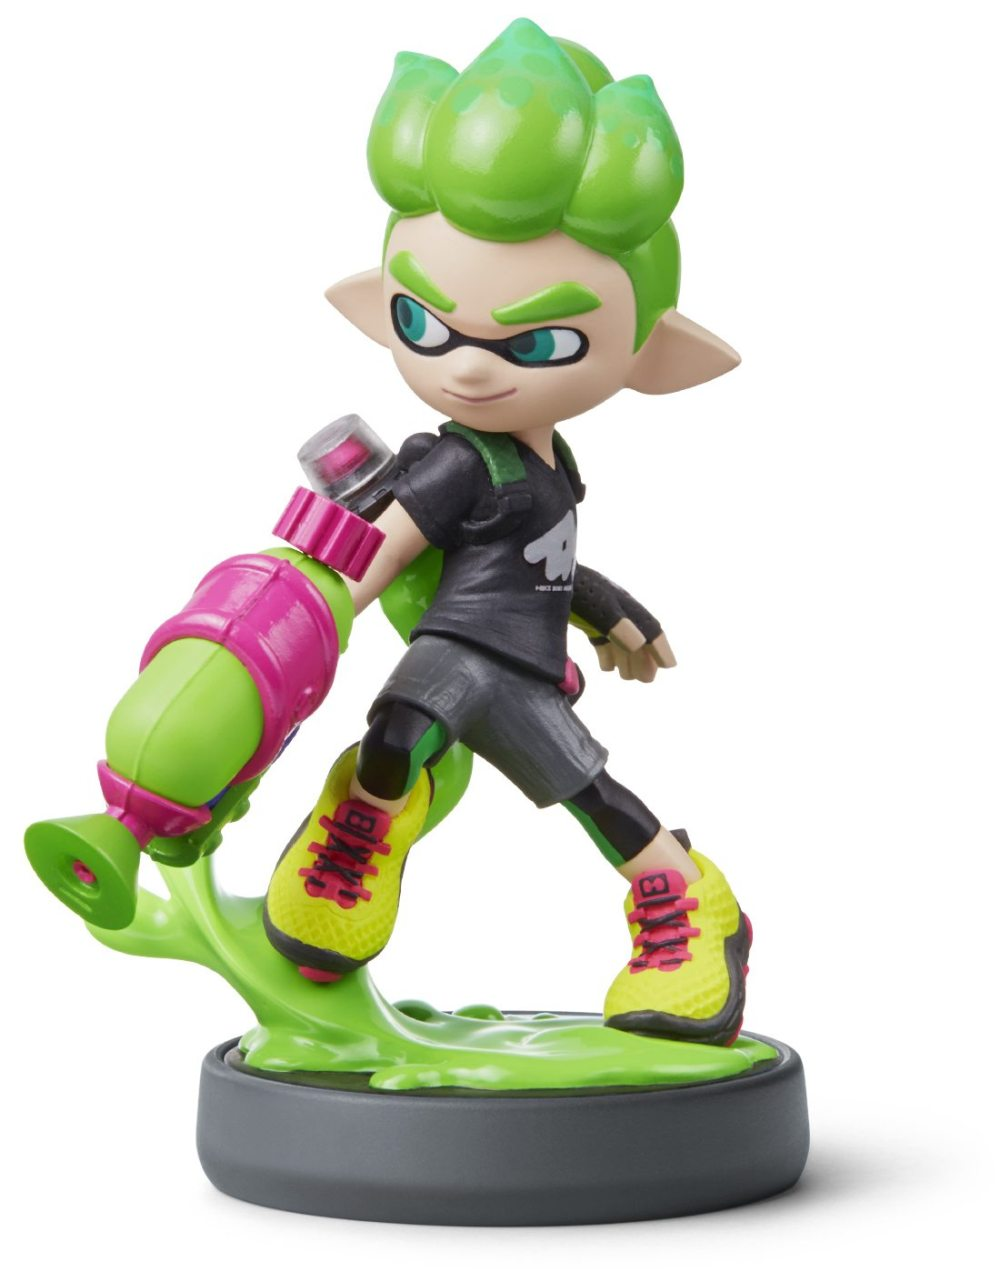 green-inkling-boy-amiibo-image